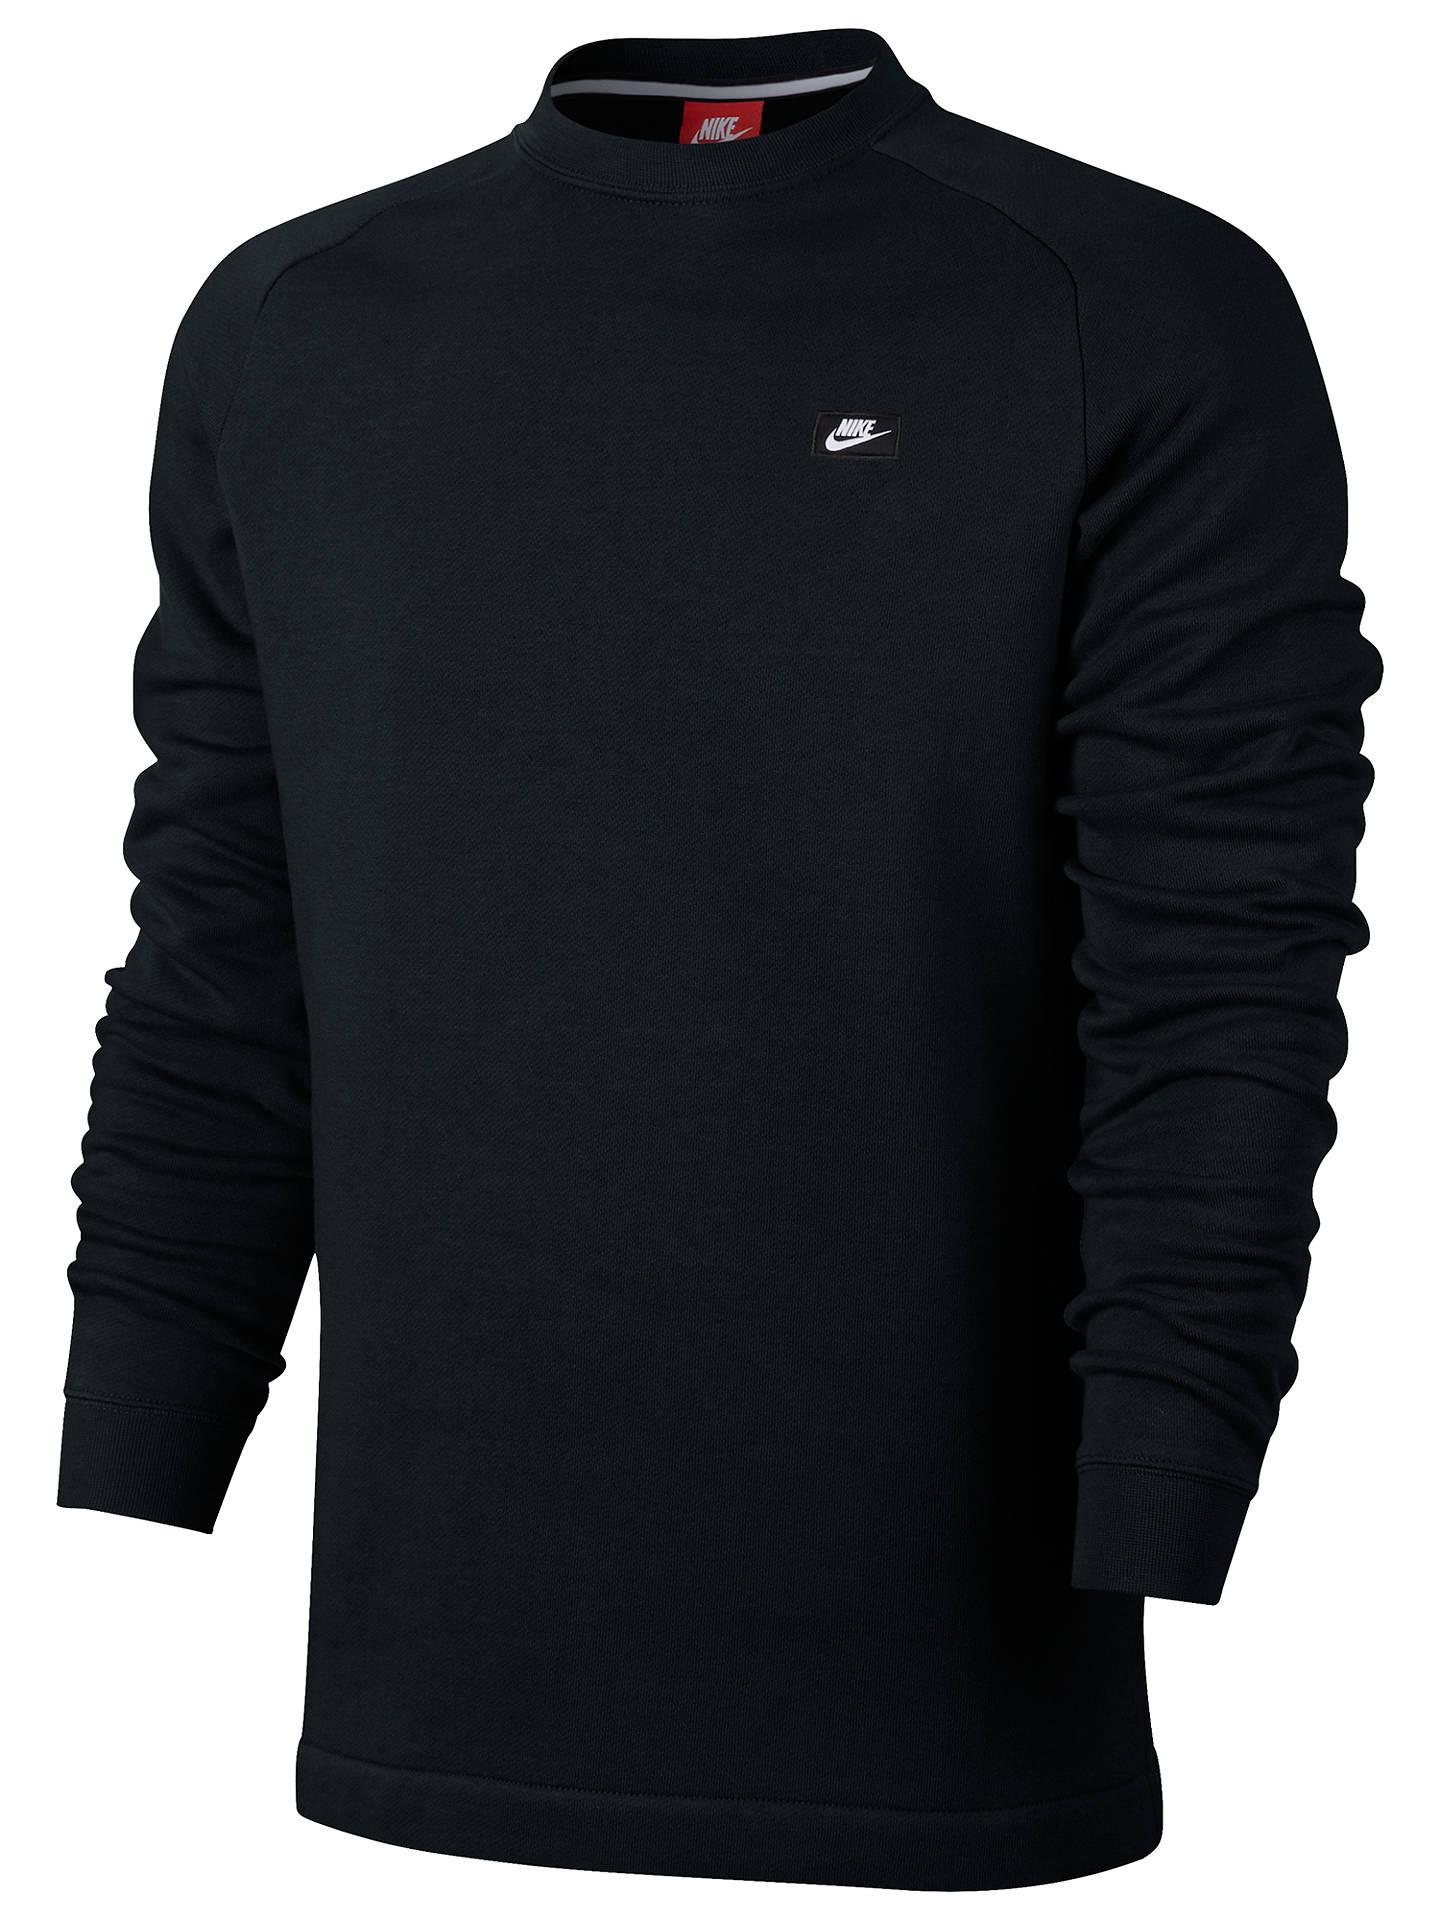 Periódico mar Mediterráneo profundidad  Nike Sportswear Modern Crew Sweatshirt at John Lewis & Partners